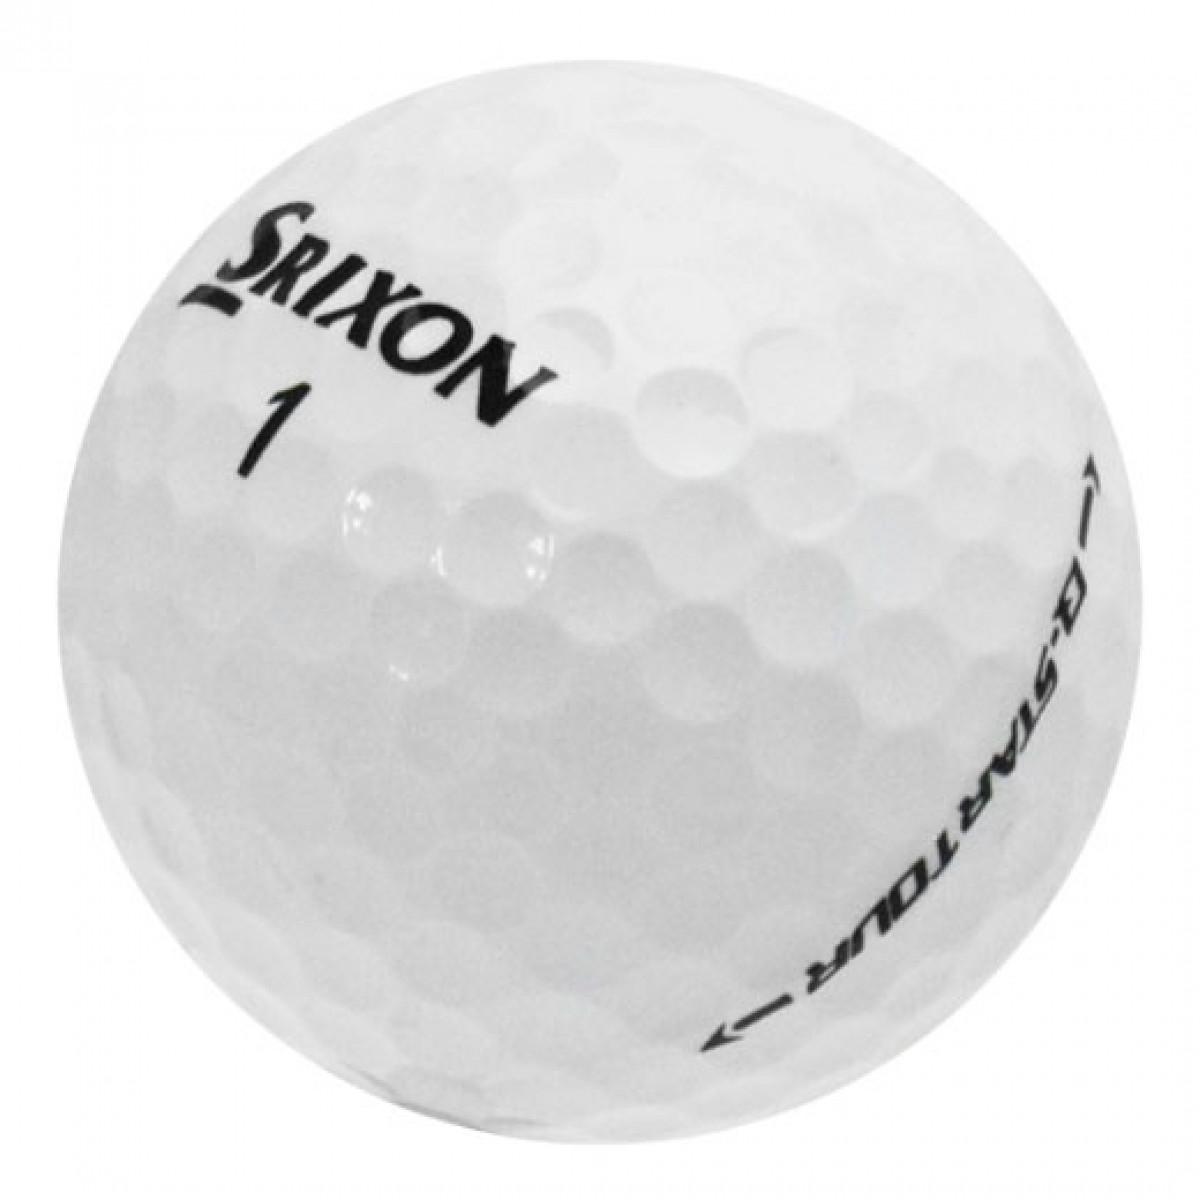 Srixon Q-Star Tour used golf balls on